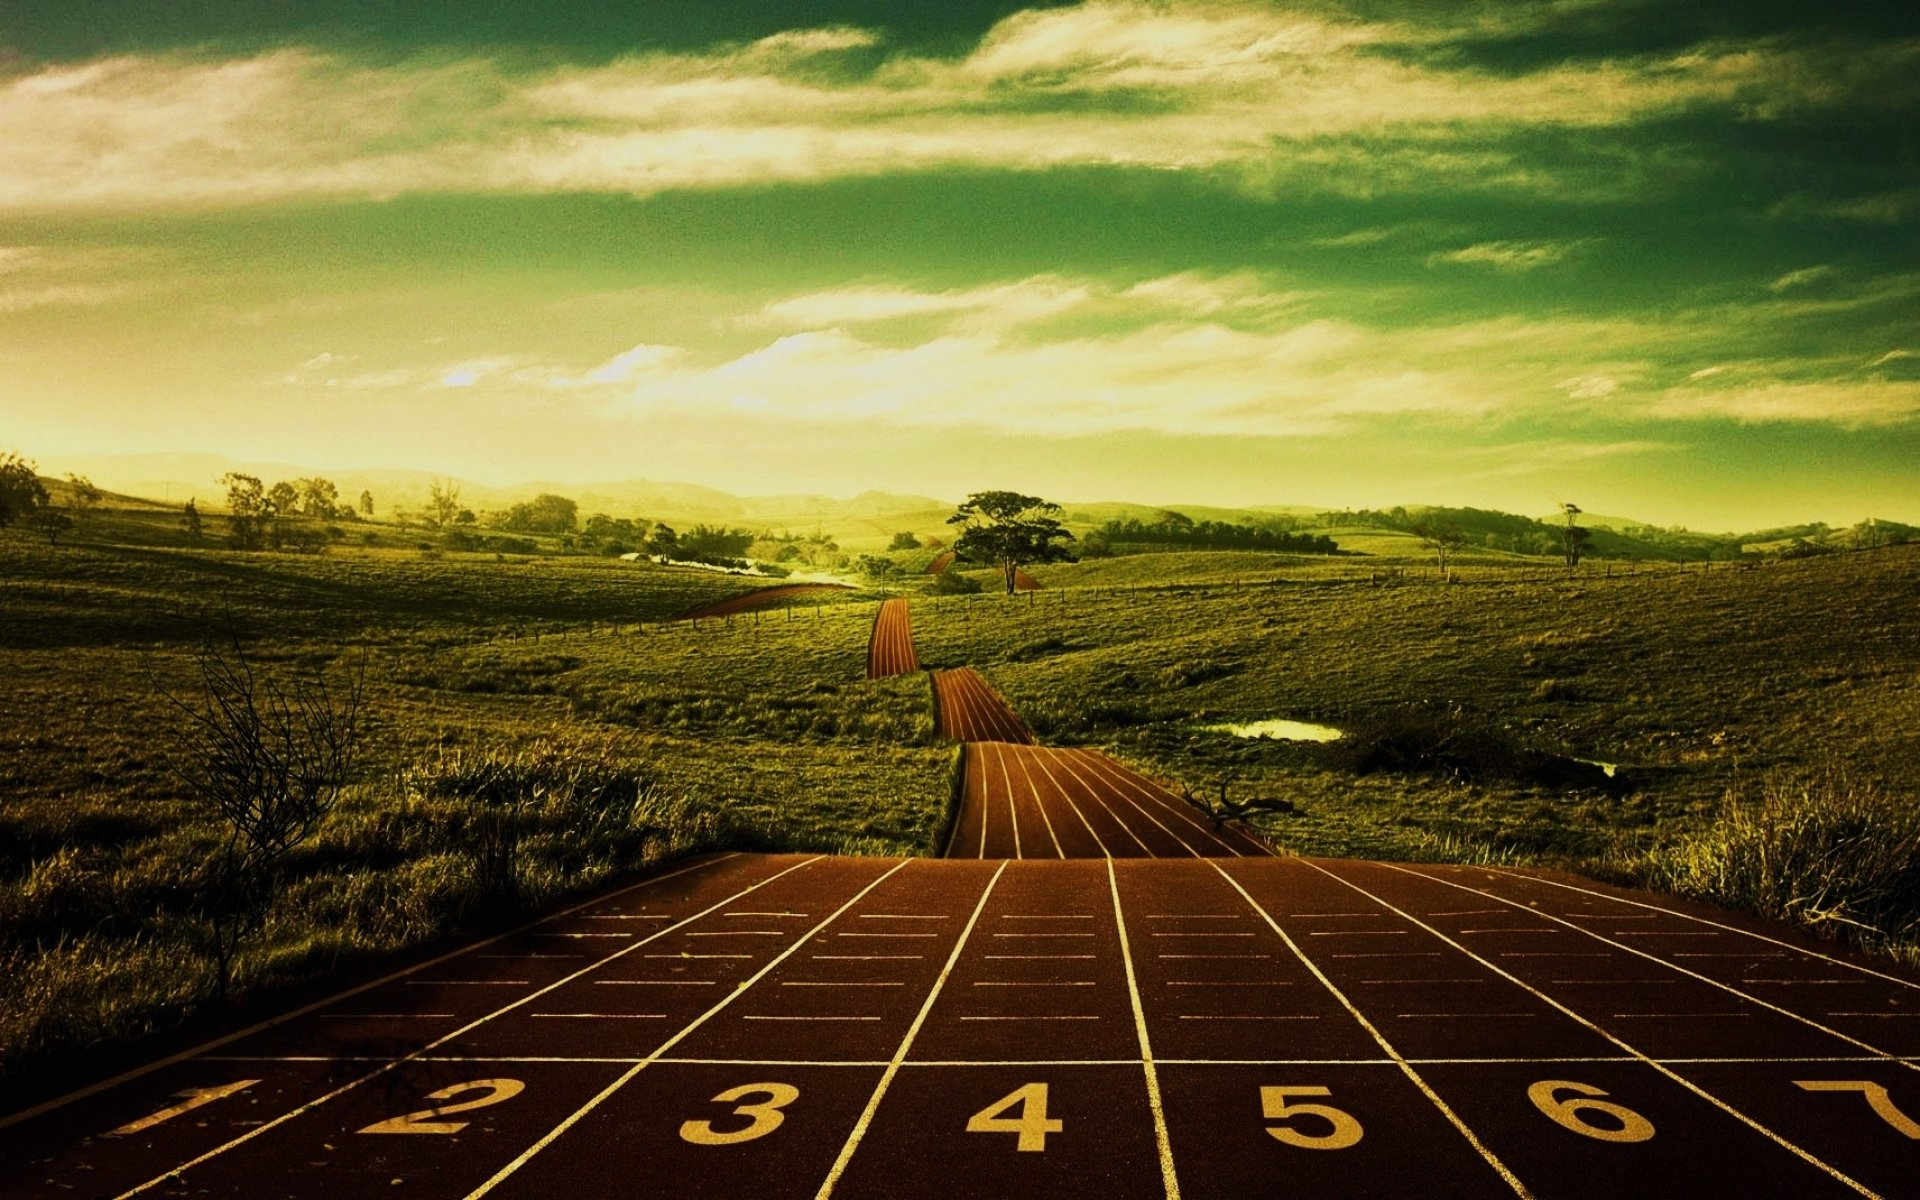 runningcircuit running jogging 2020x1070 wallpaper 5265download 1920x1200